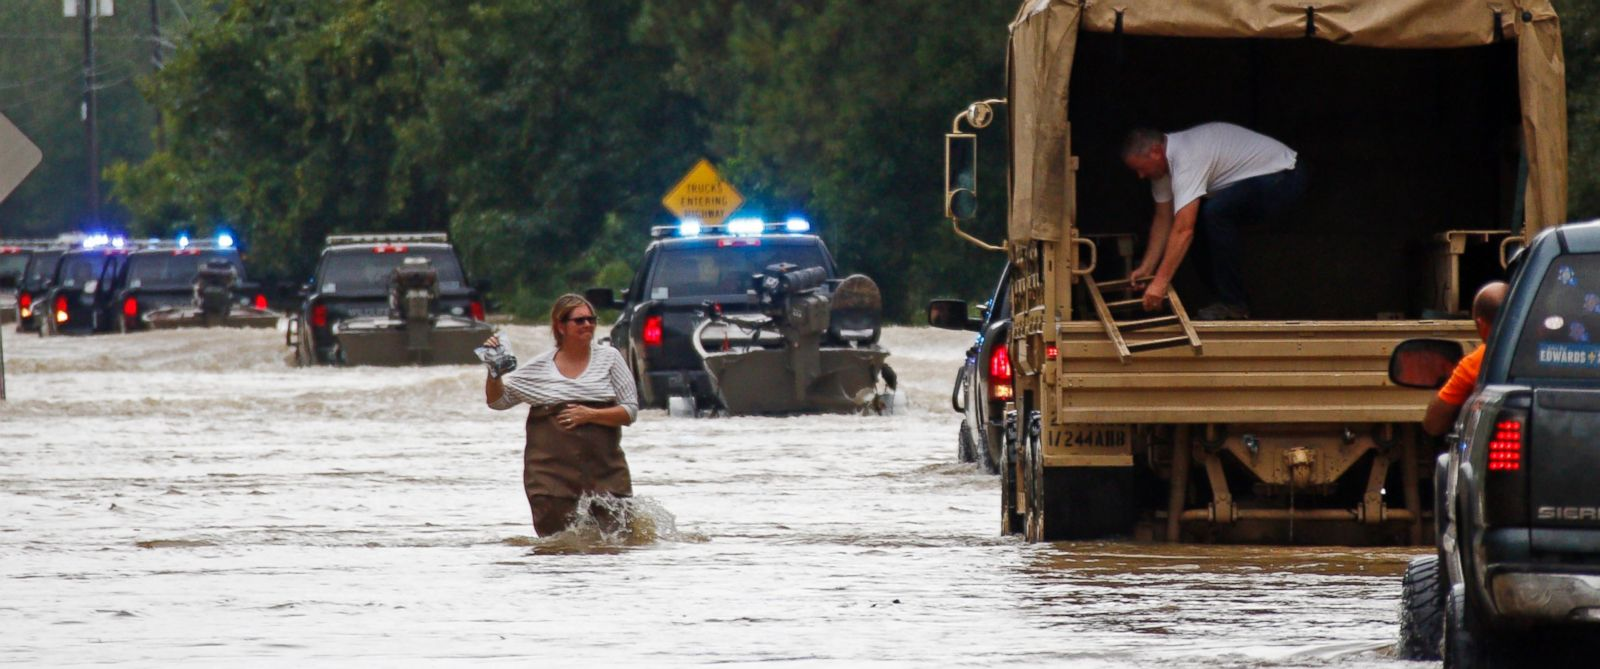 AP louisiana flooding 1 jt 160814 12x5 1600